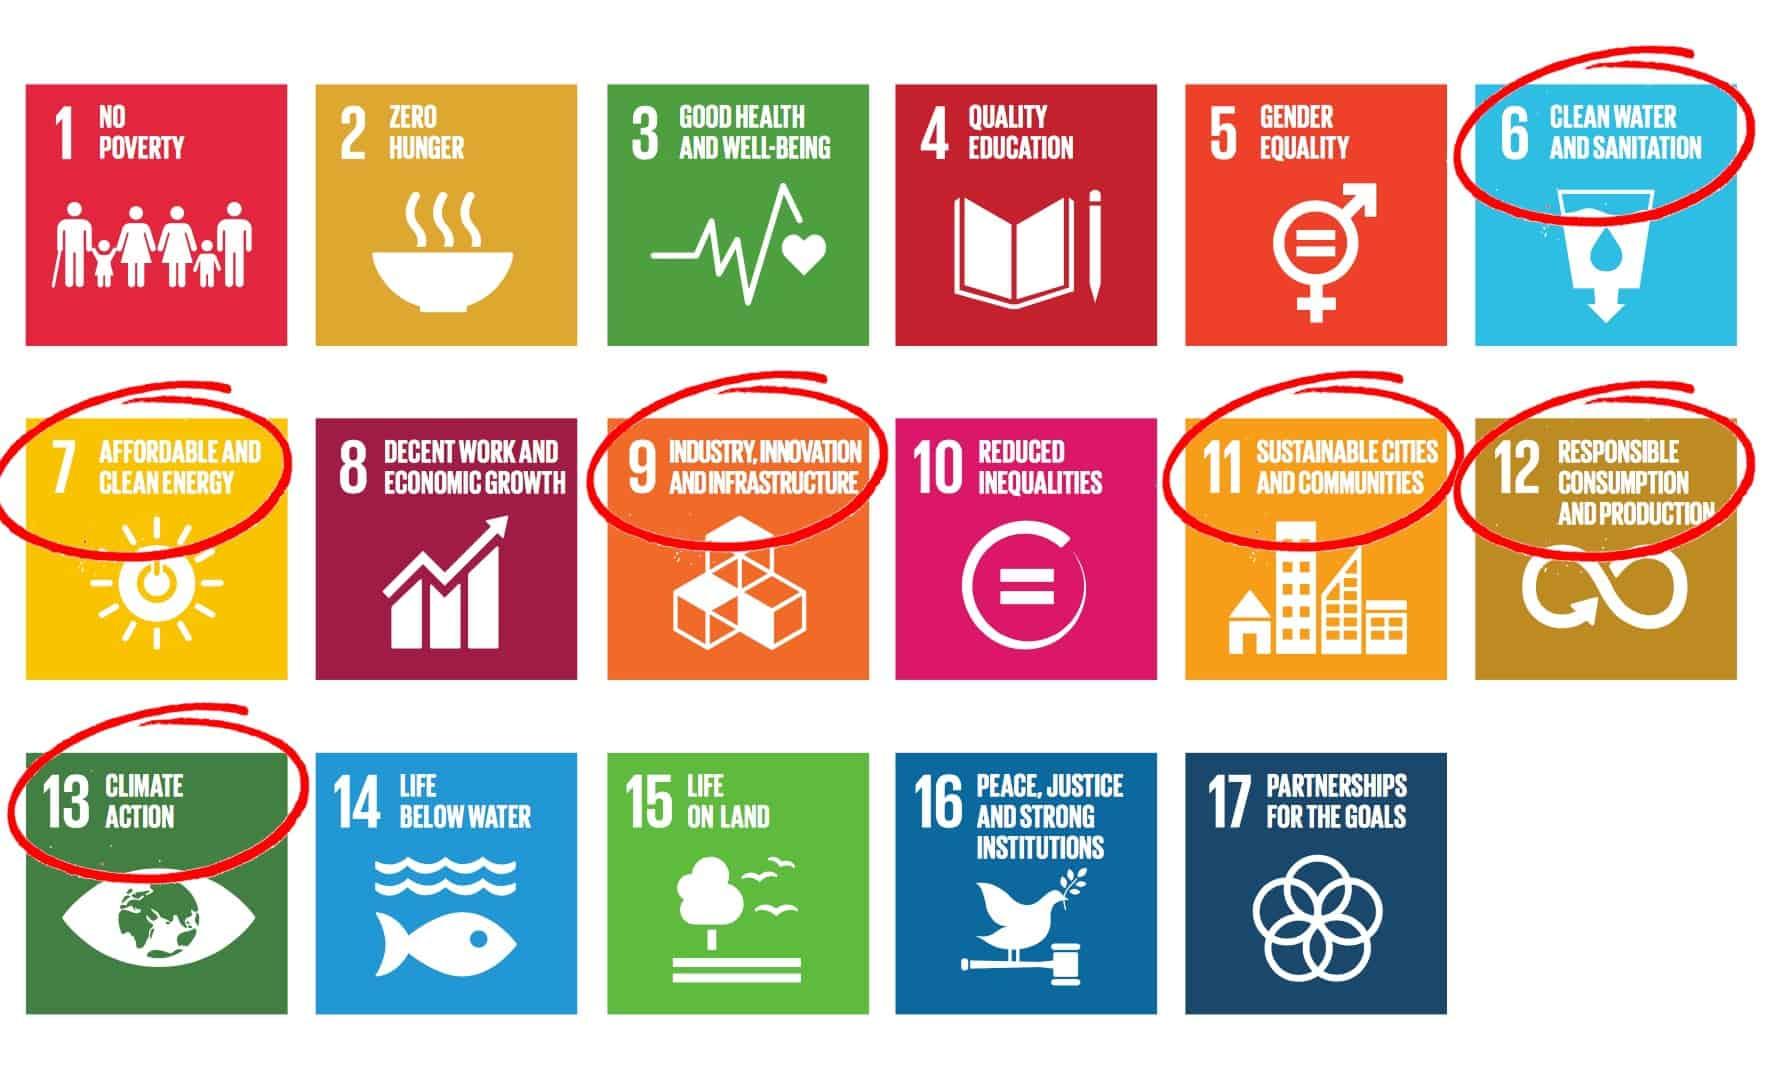 Novable - Sustainable Development Goals (SDG'S)